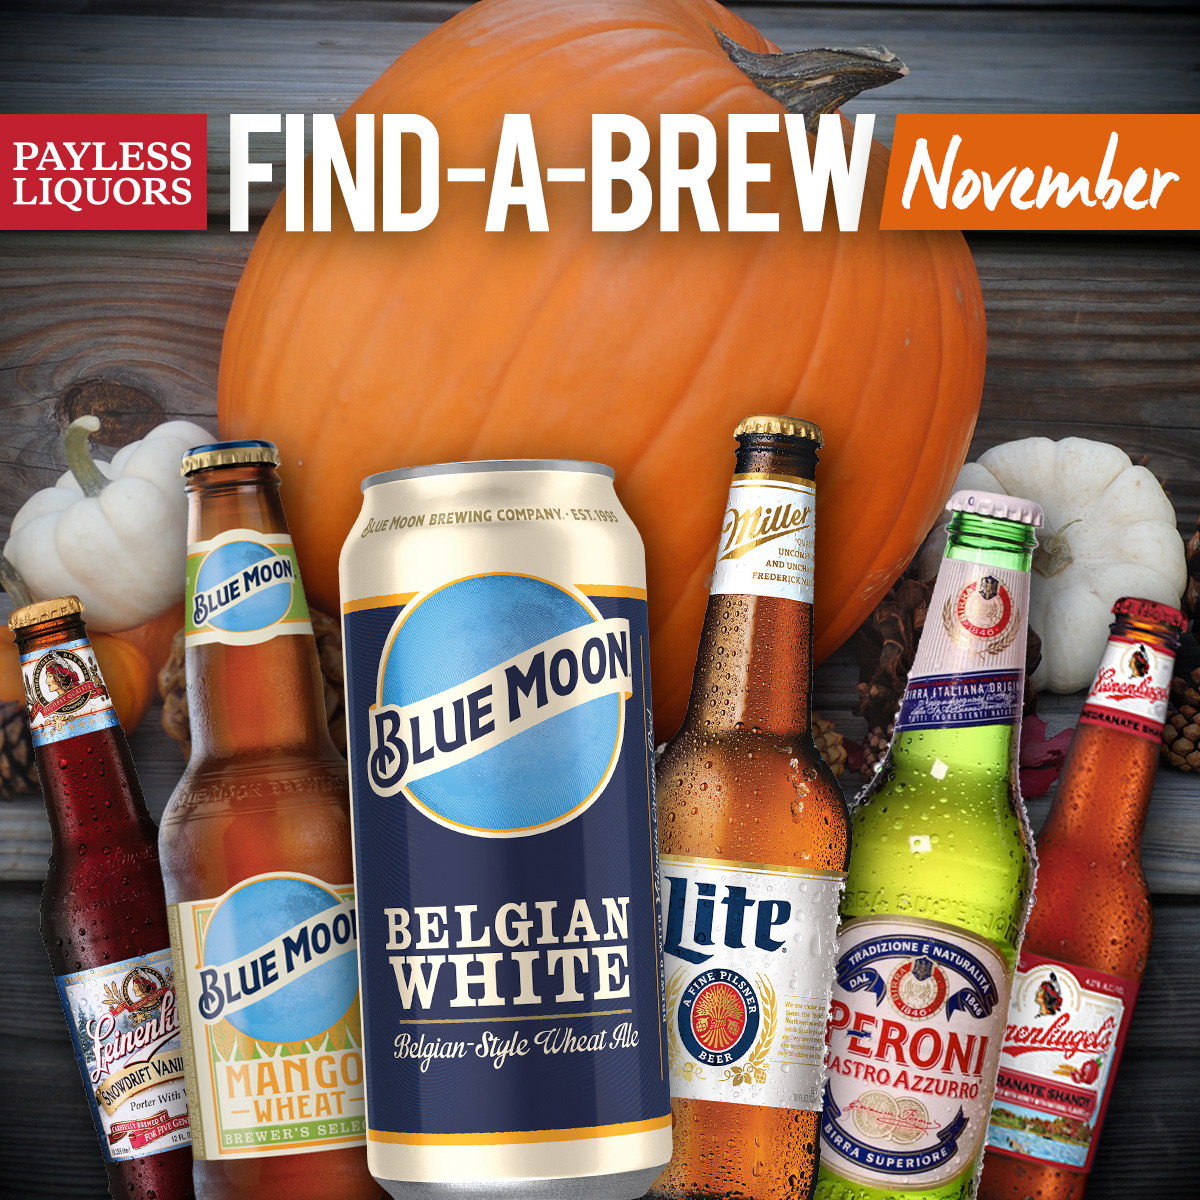 November Find-a-Brew